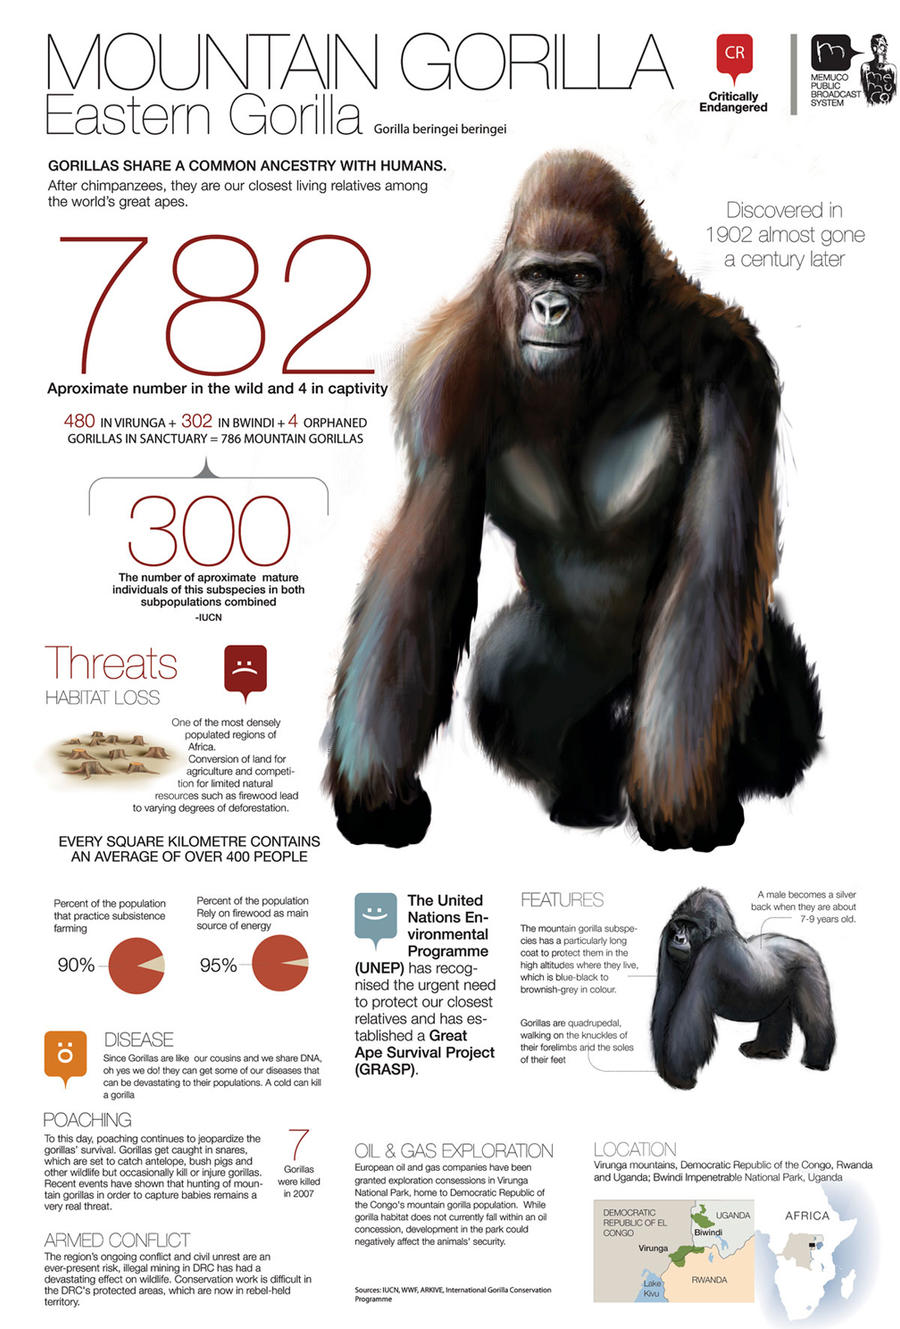 782 mountain gorillas by memuco on DeviantArt